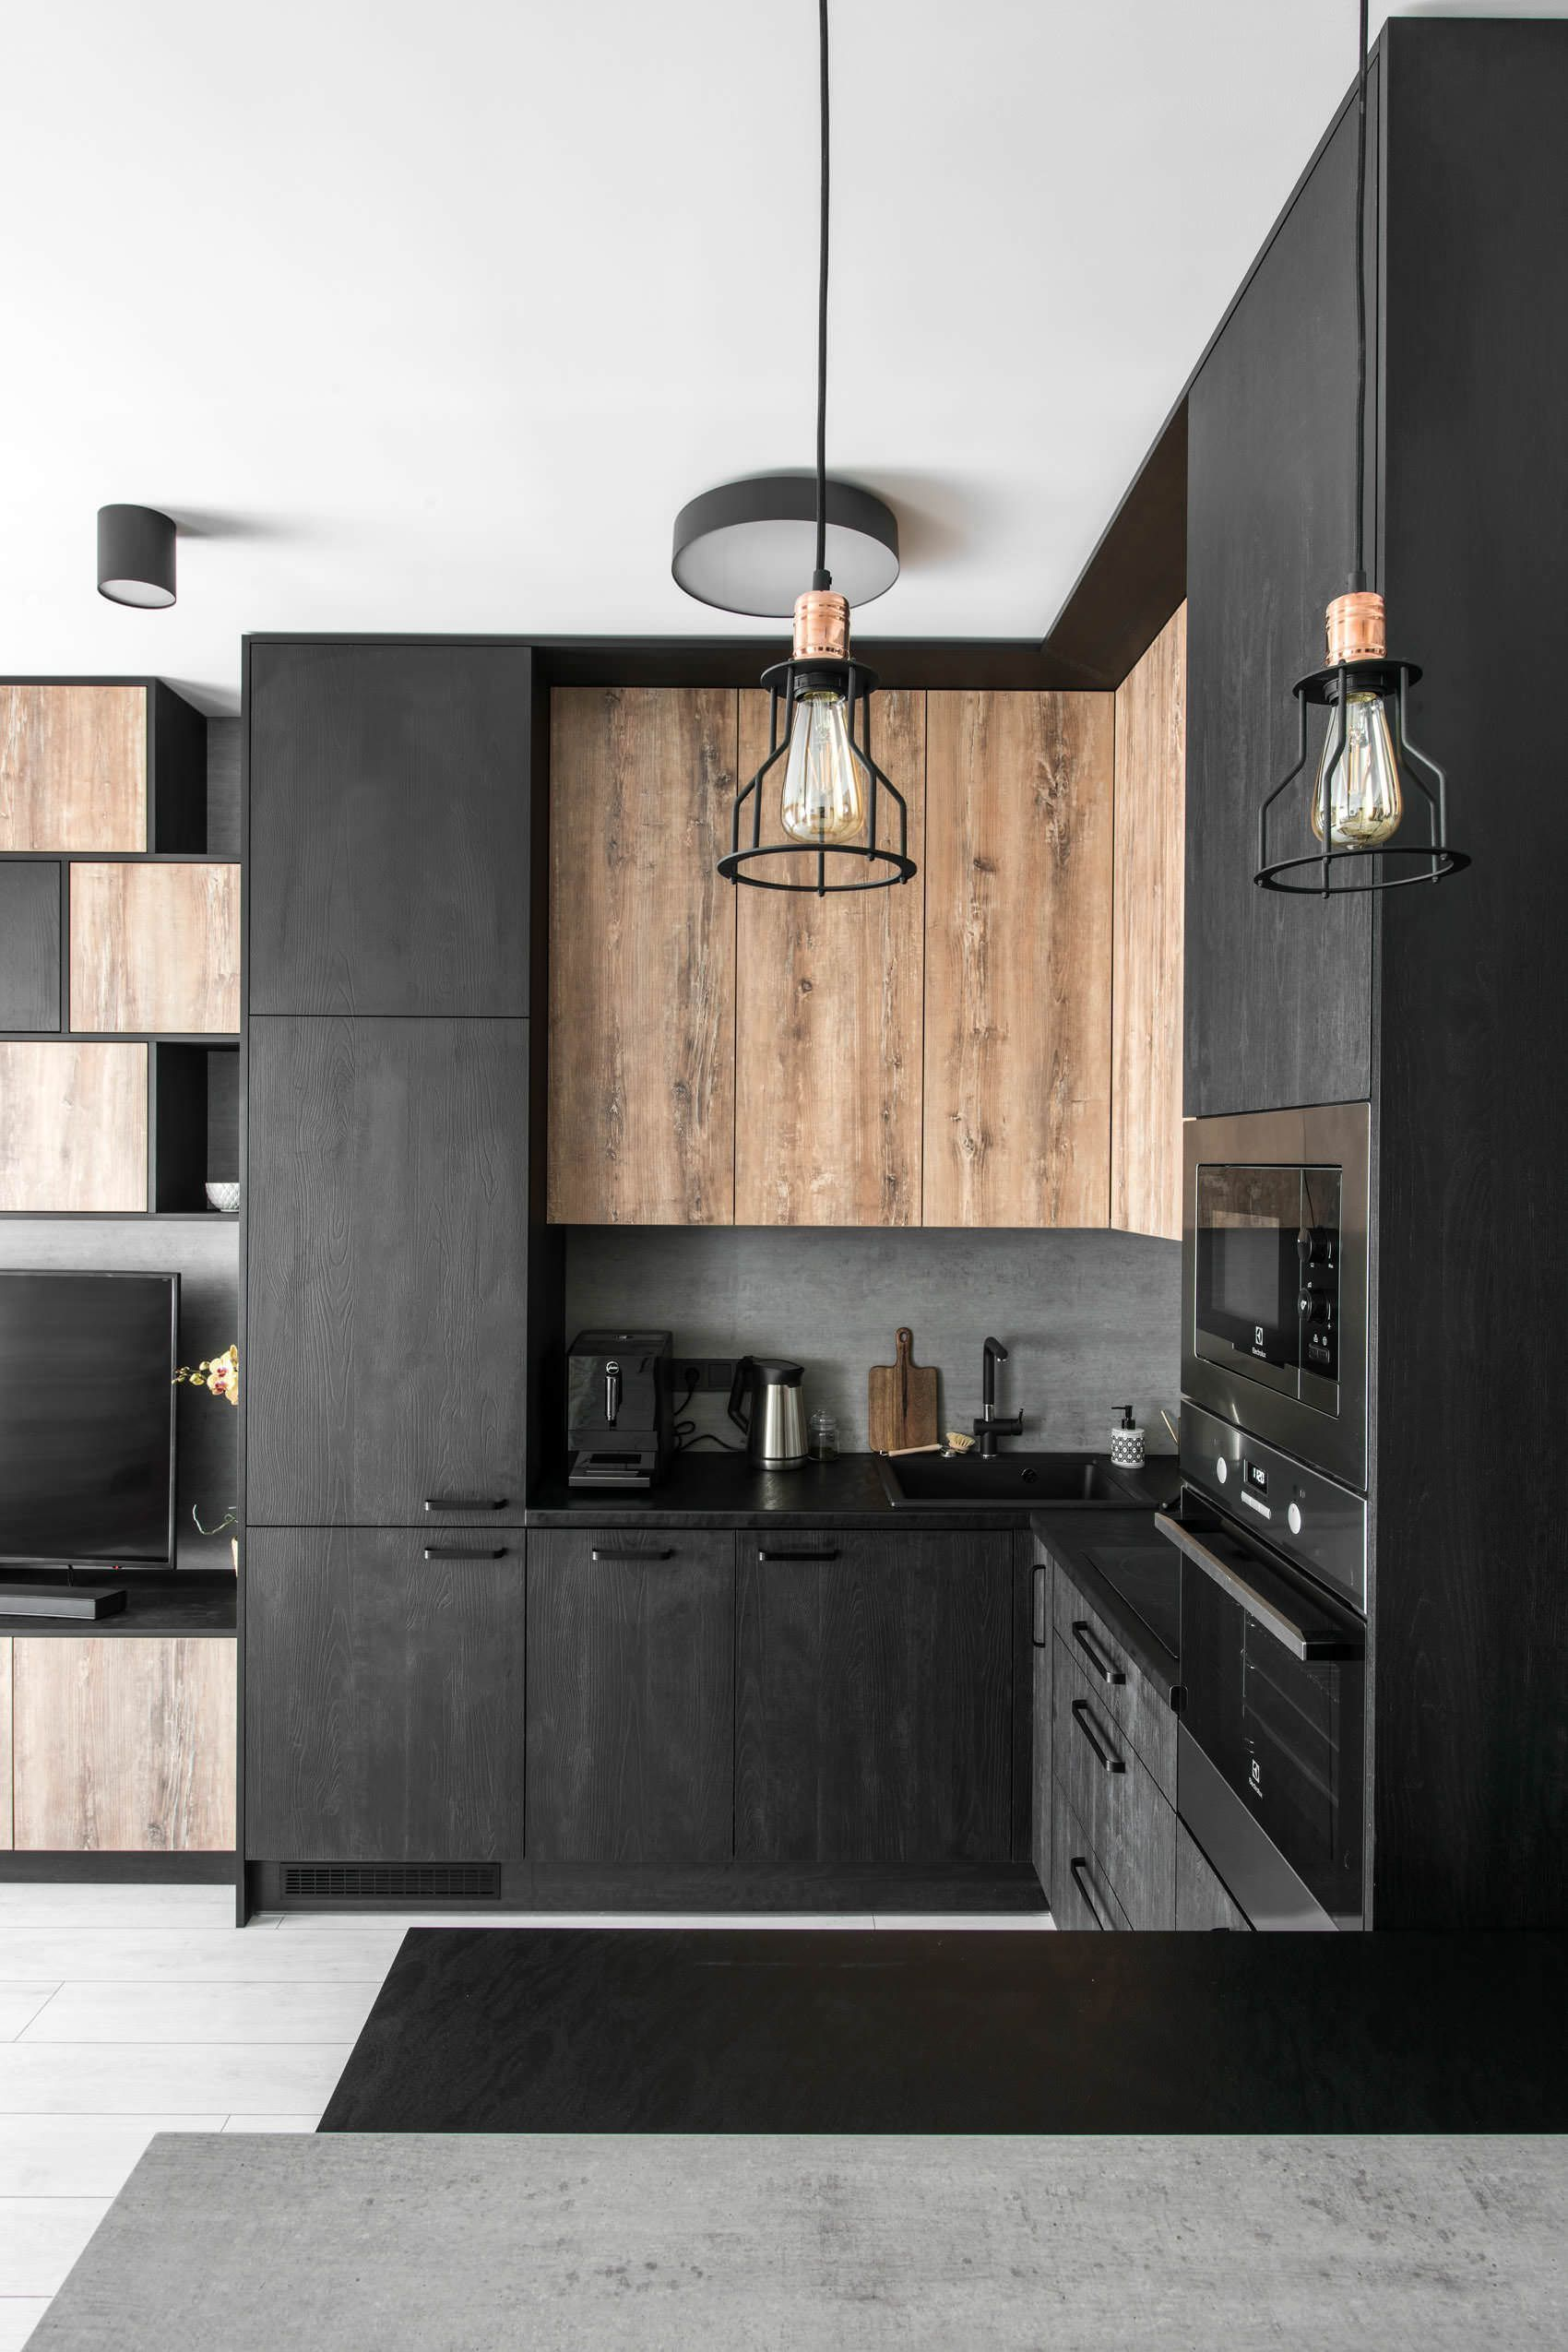 33 The Coolest Trend In 2019 Kitchen Interior Design Idea